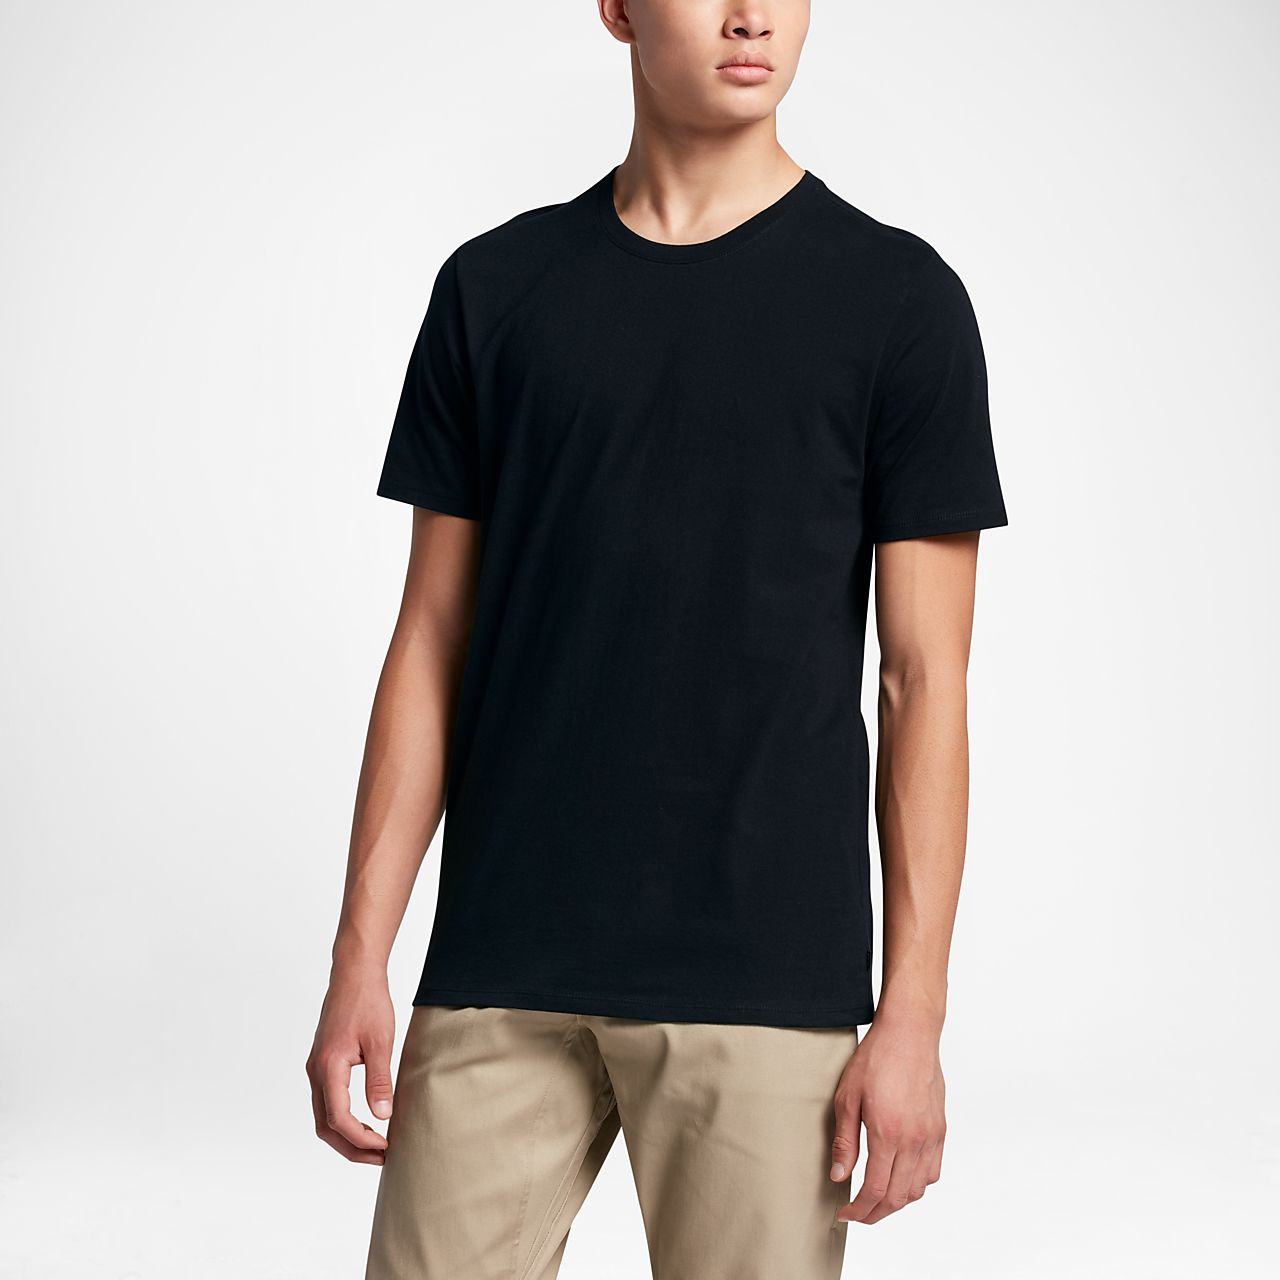 Tee-shirt Nike SB Essential pour Homme